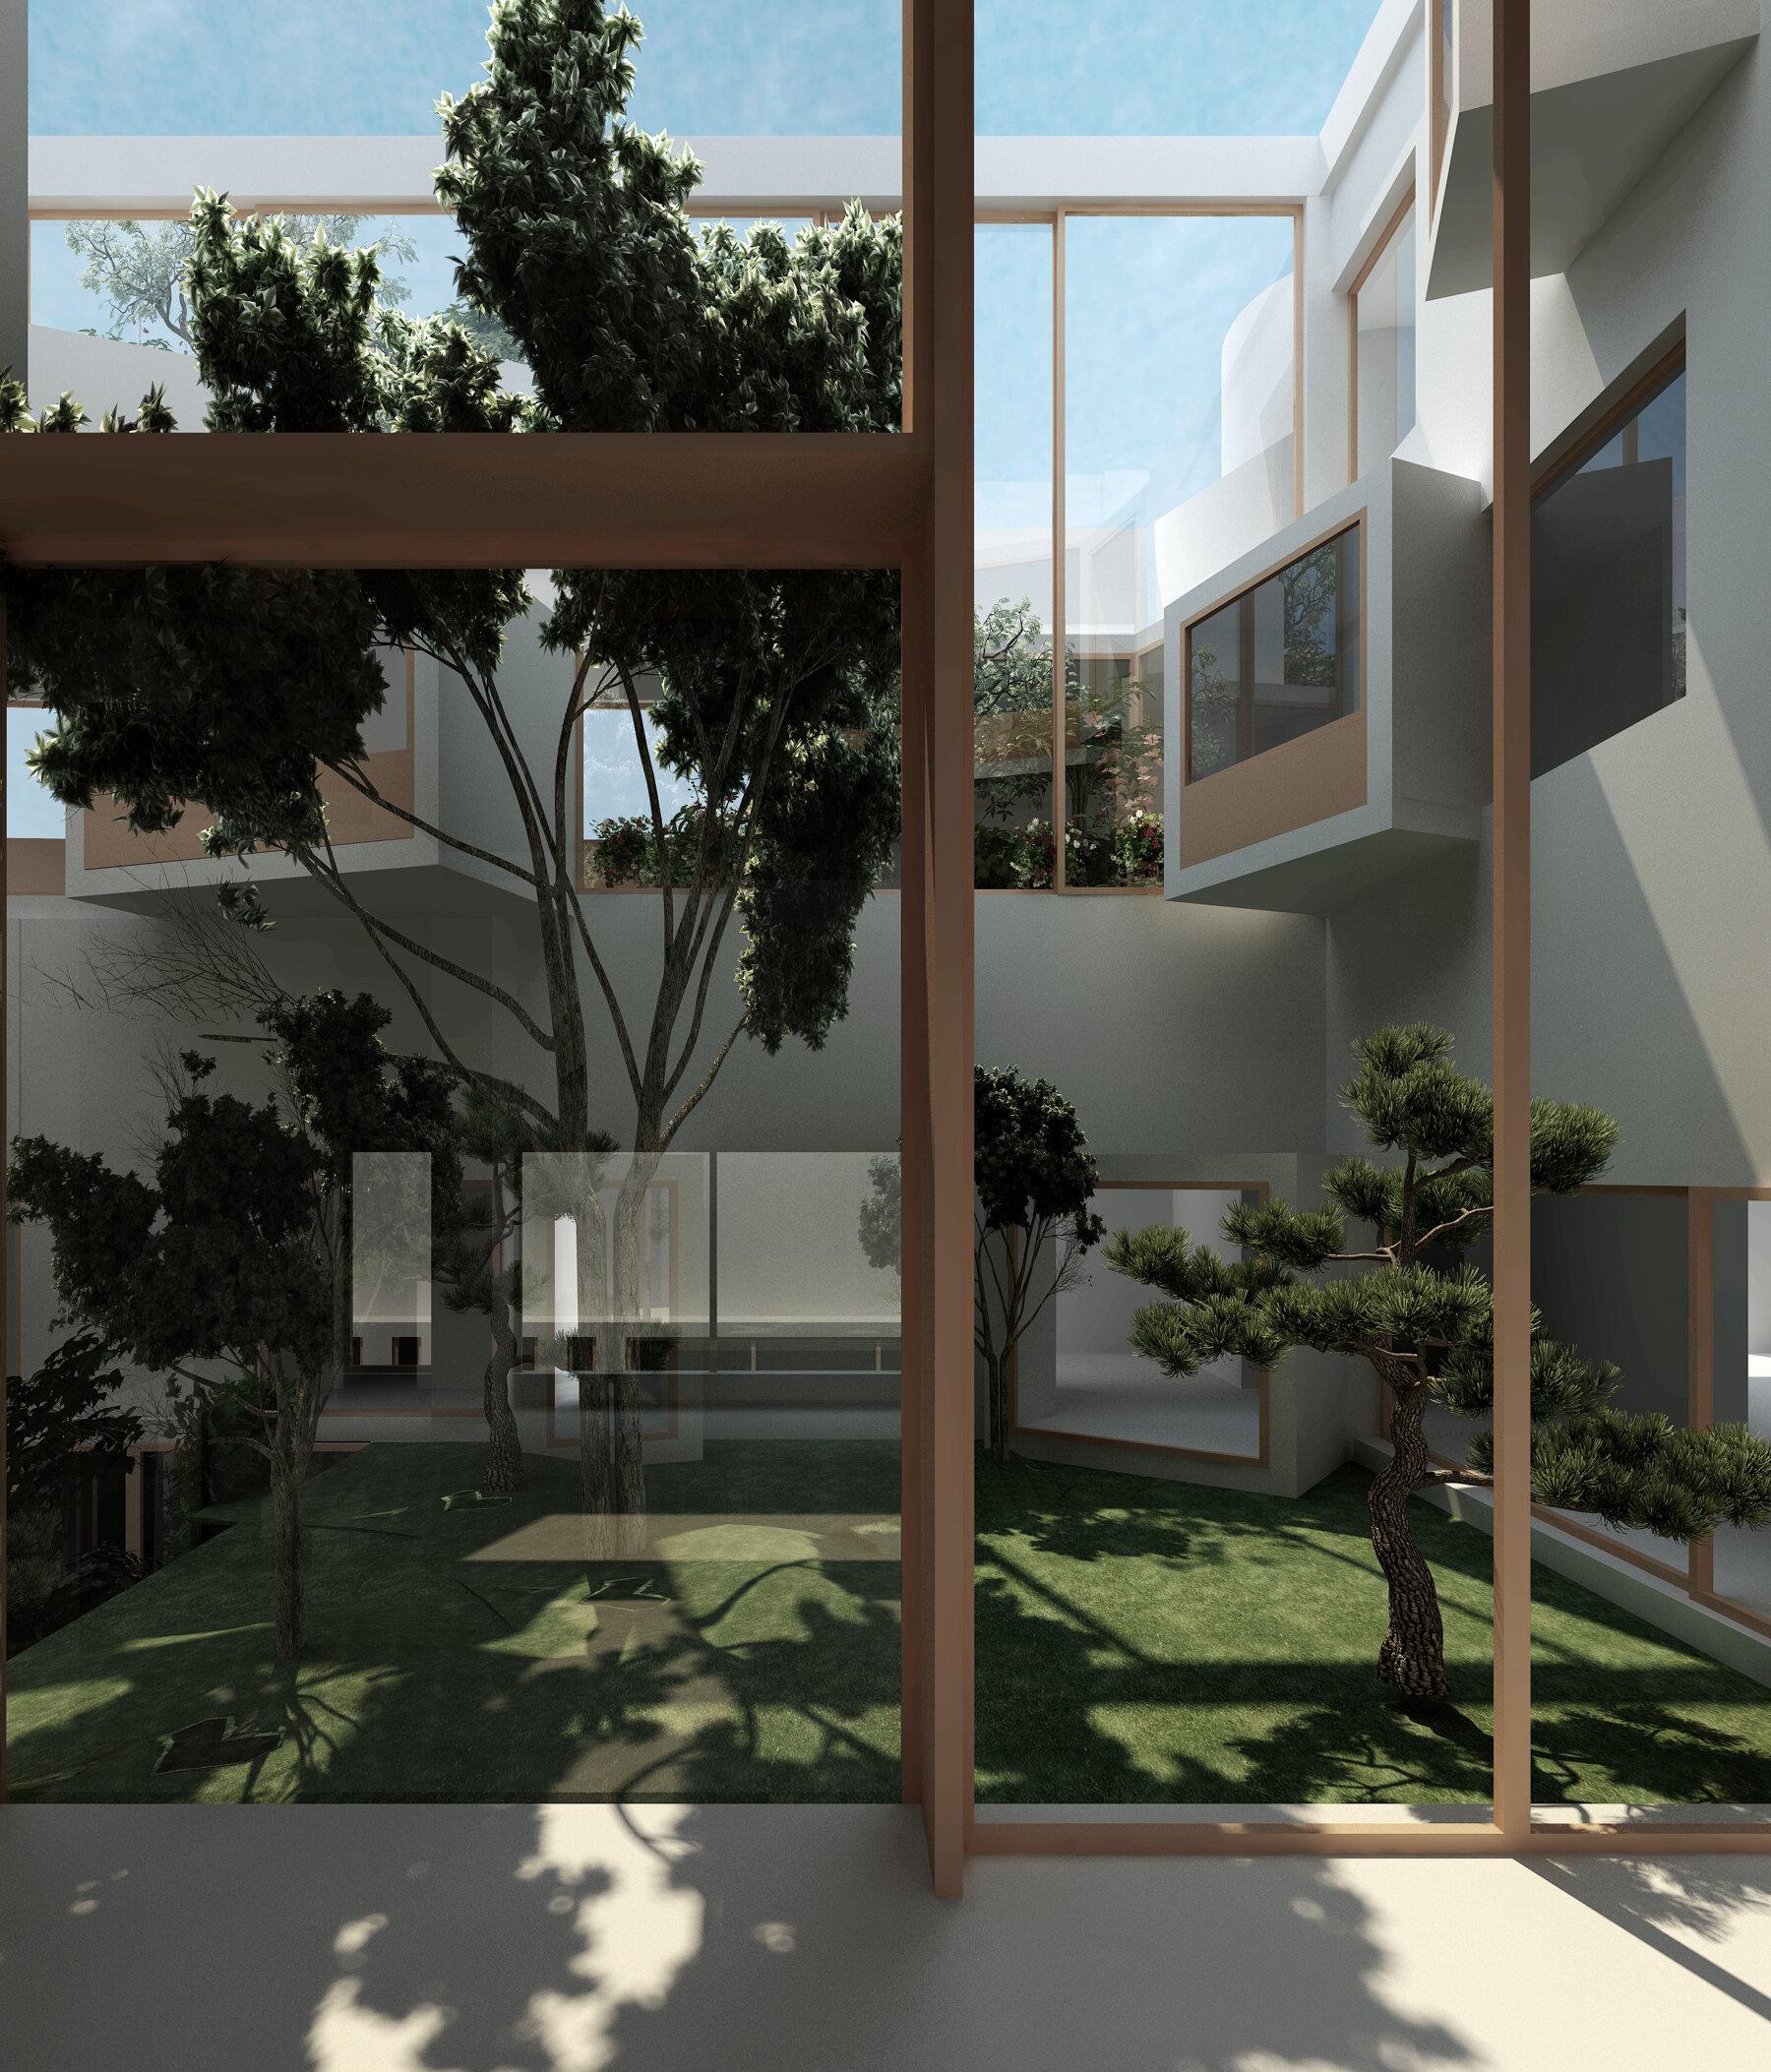 Maison à ChangChun